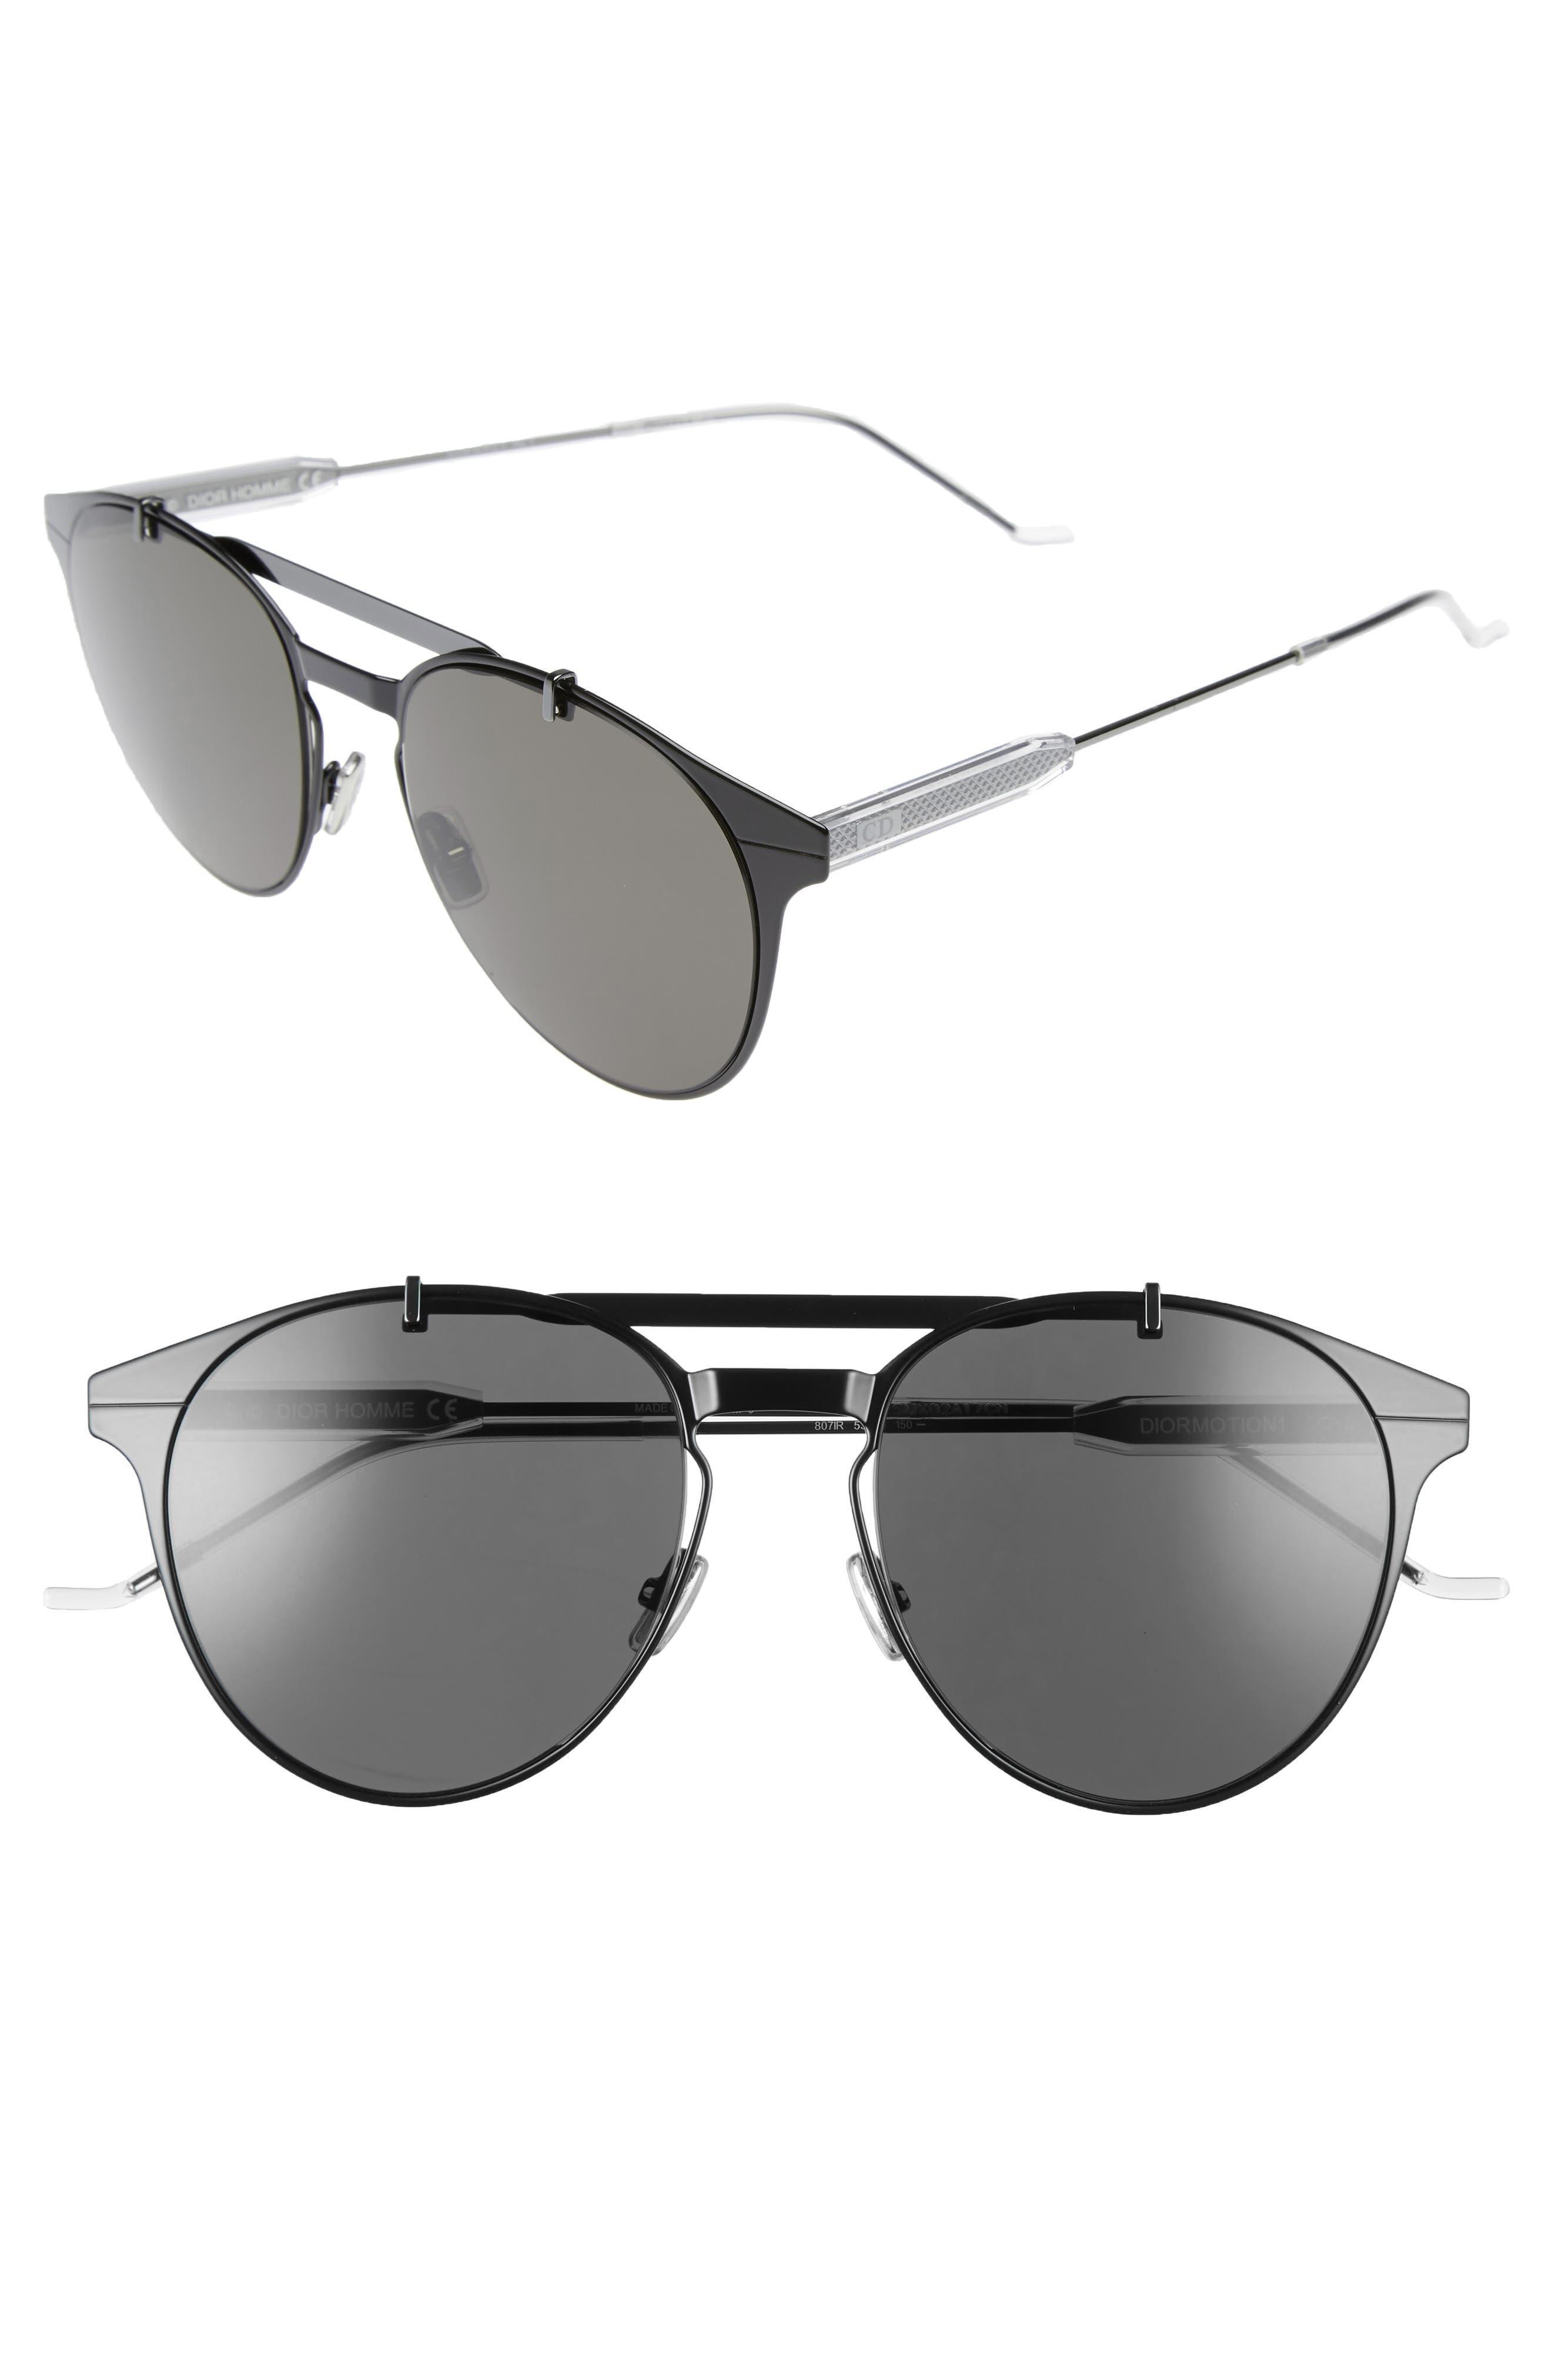 Motion 53mm Sunglasses,                             Main thumbnail 1, color,                             Black